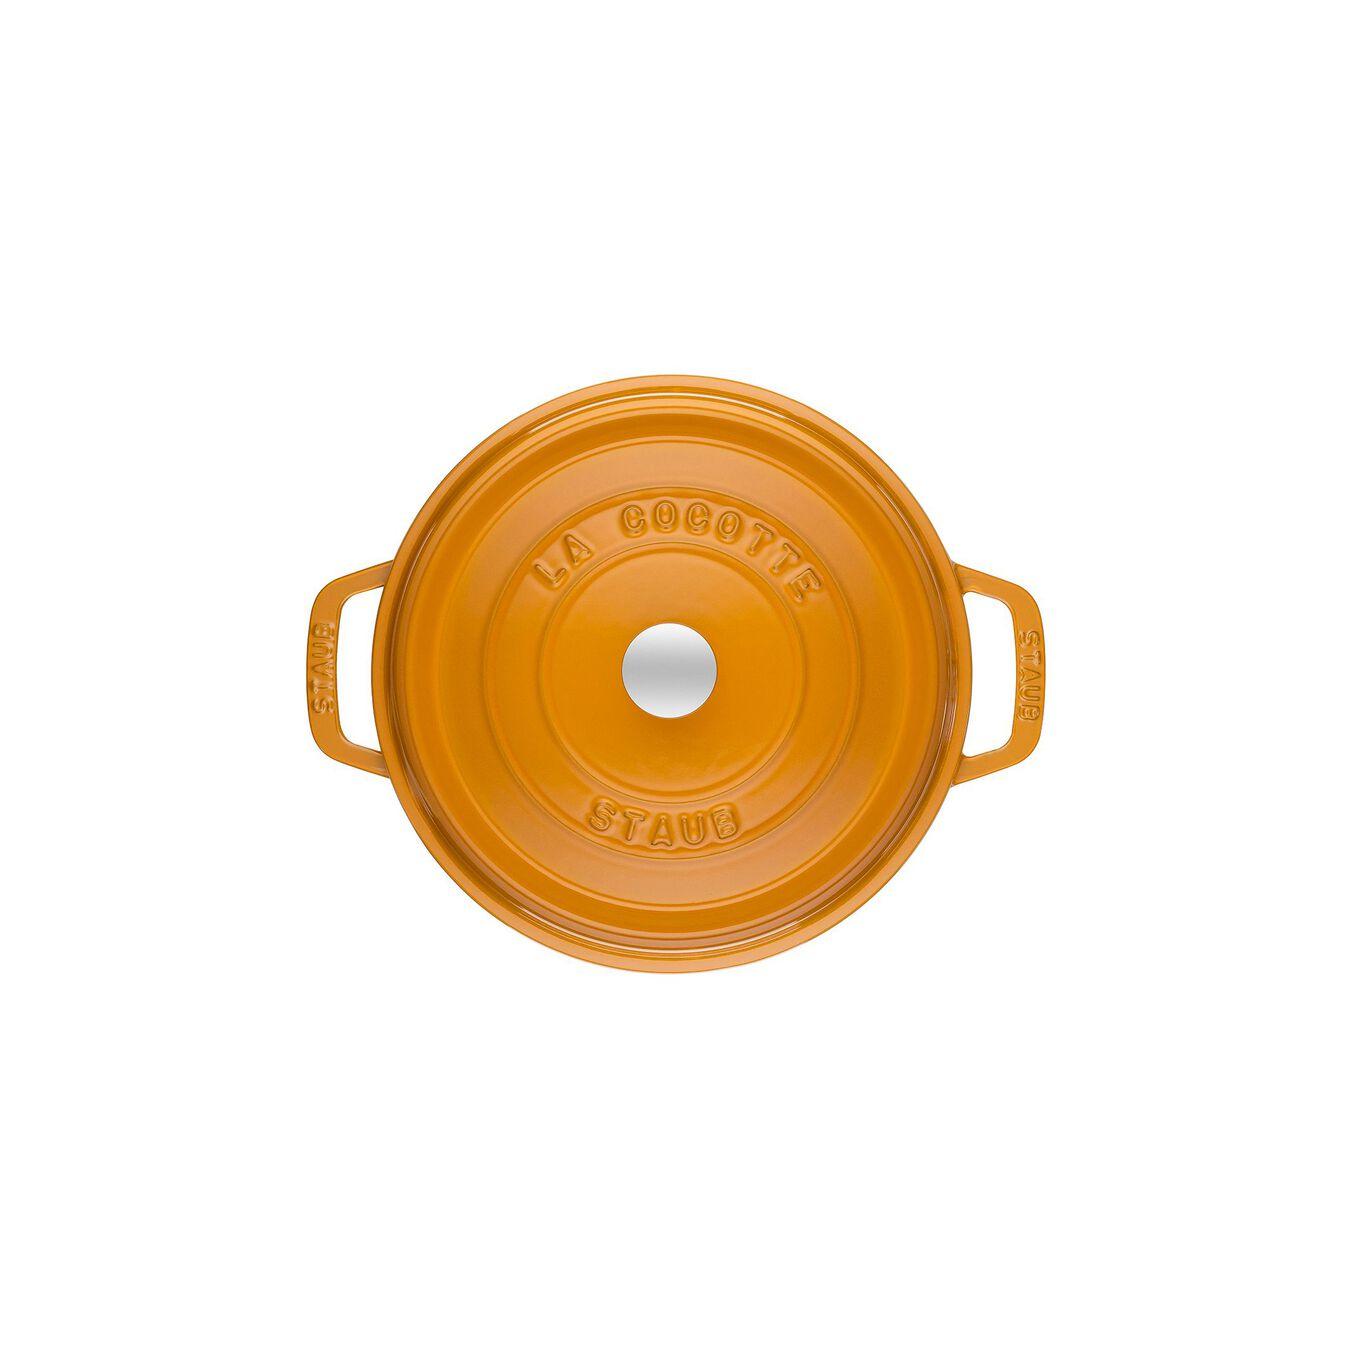 Cocotte 24 cm, rund, Senf, Gusseisen,,large 4